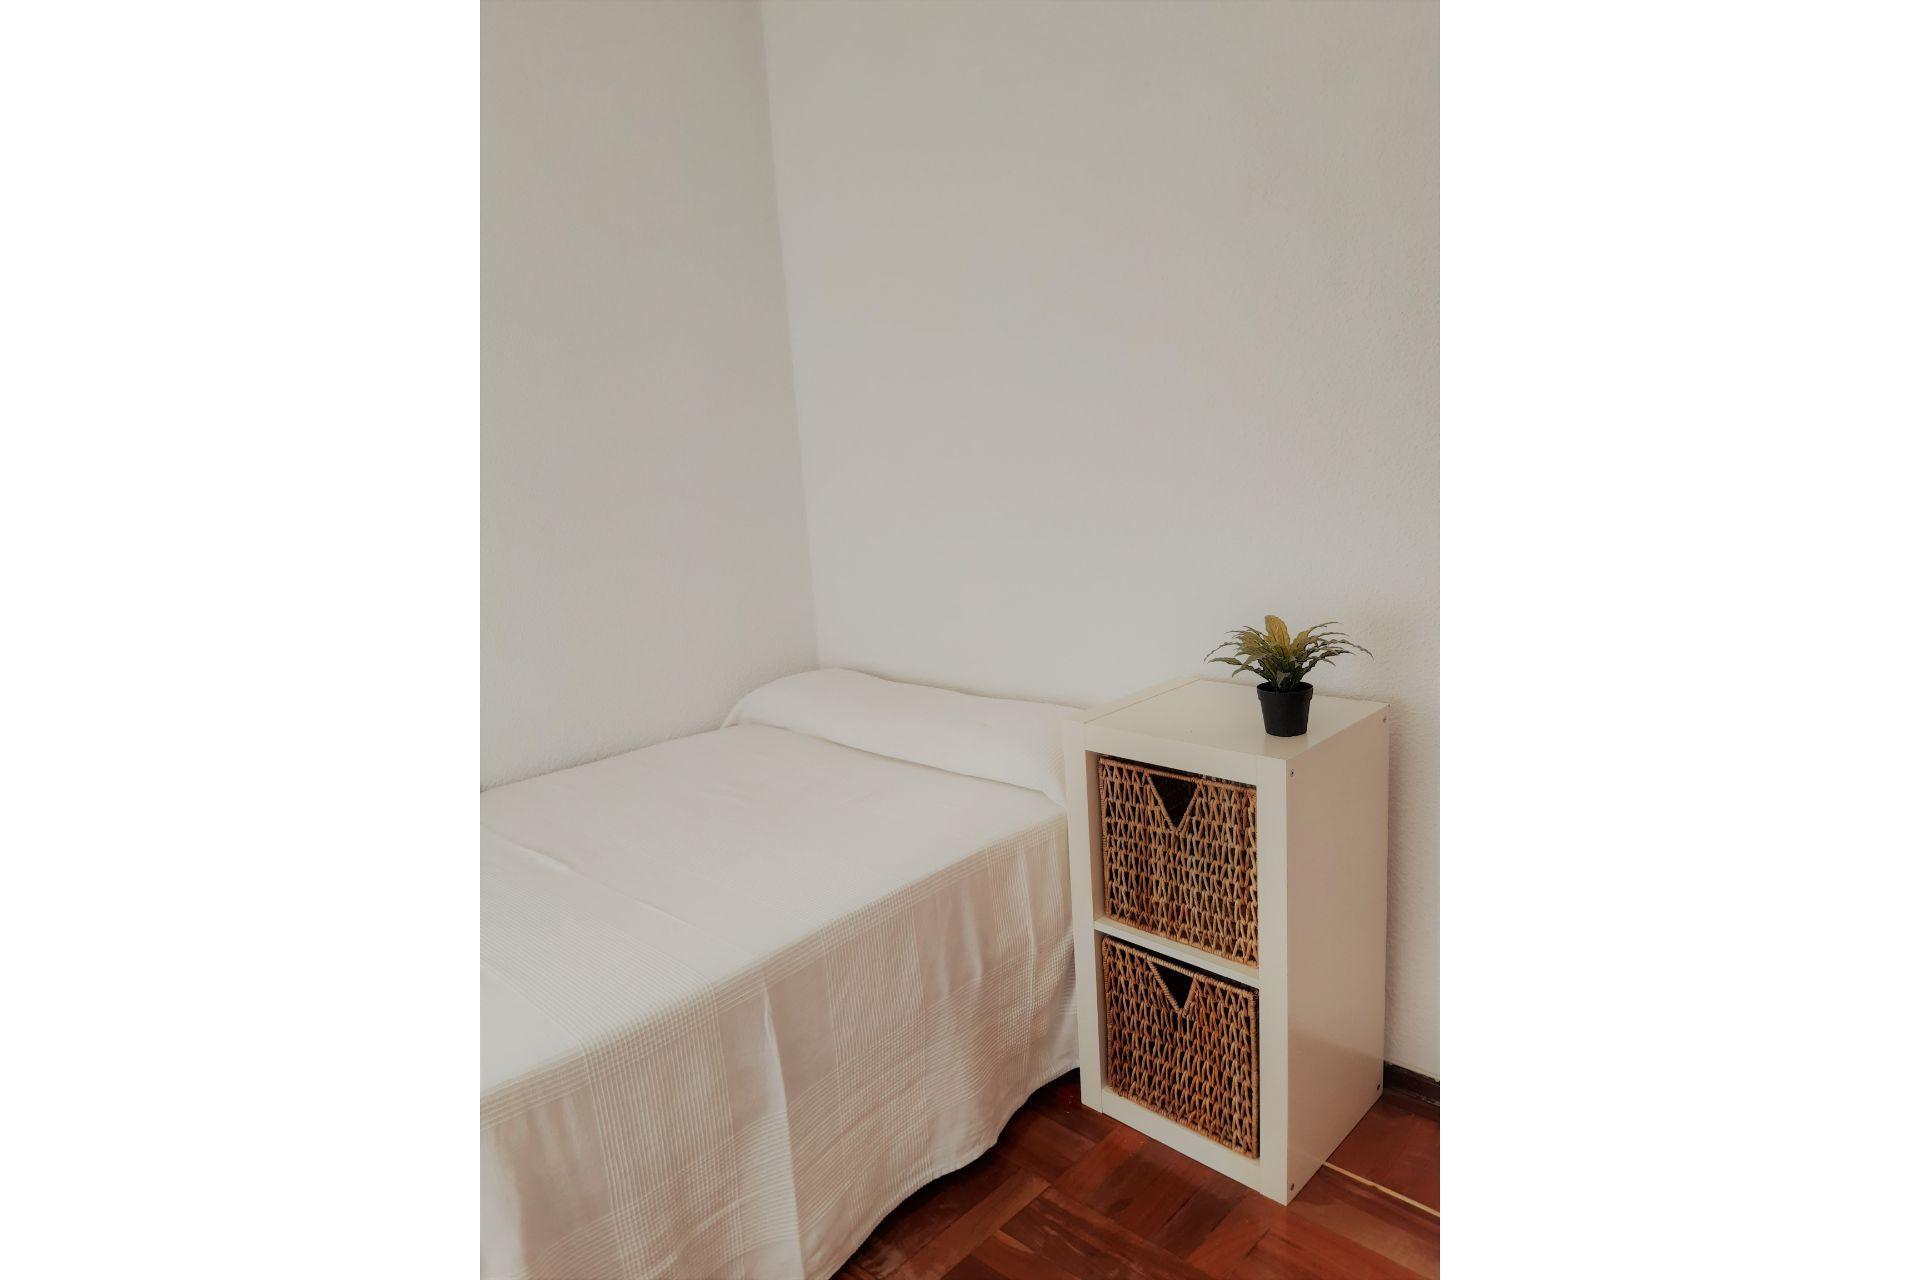 alquiler de habitaciones madrid elena